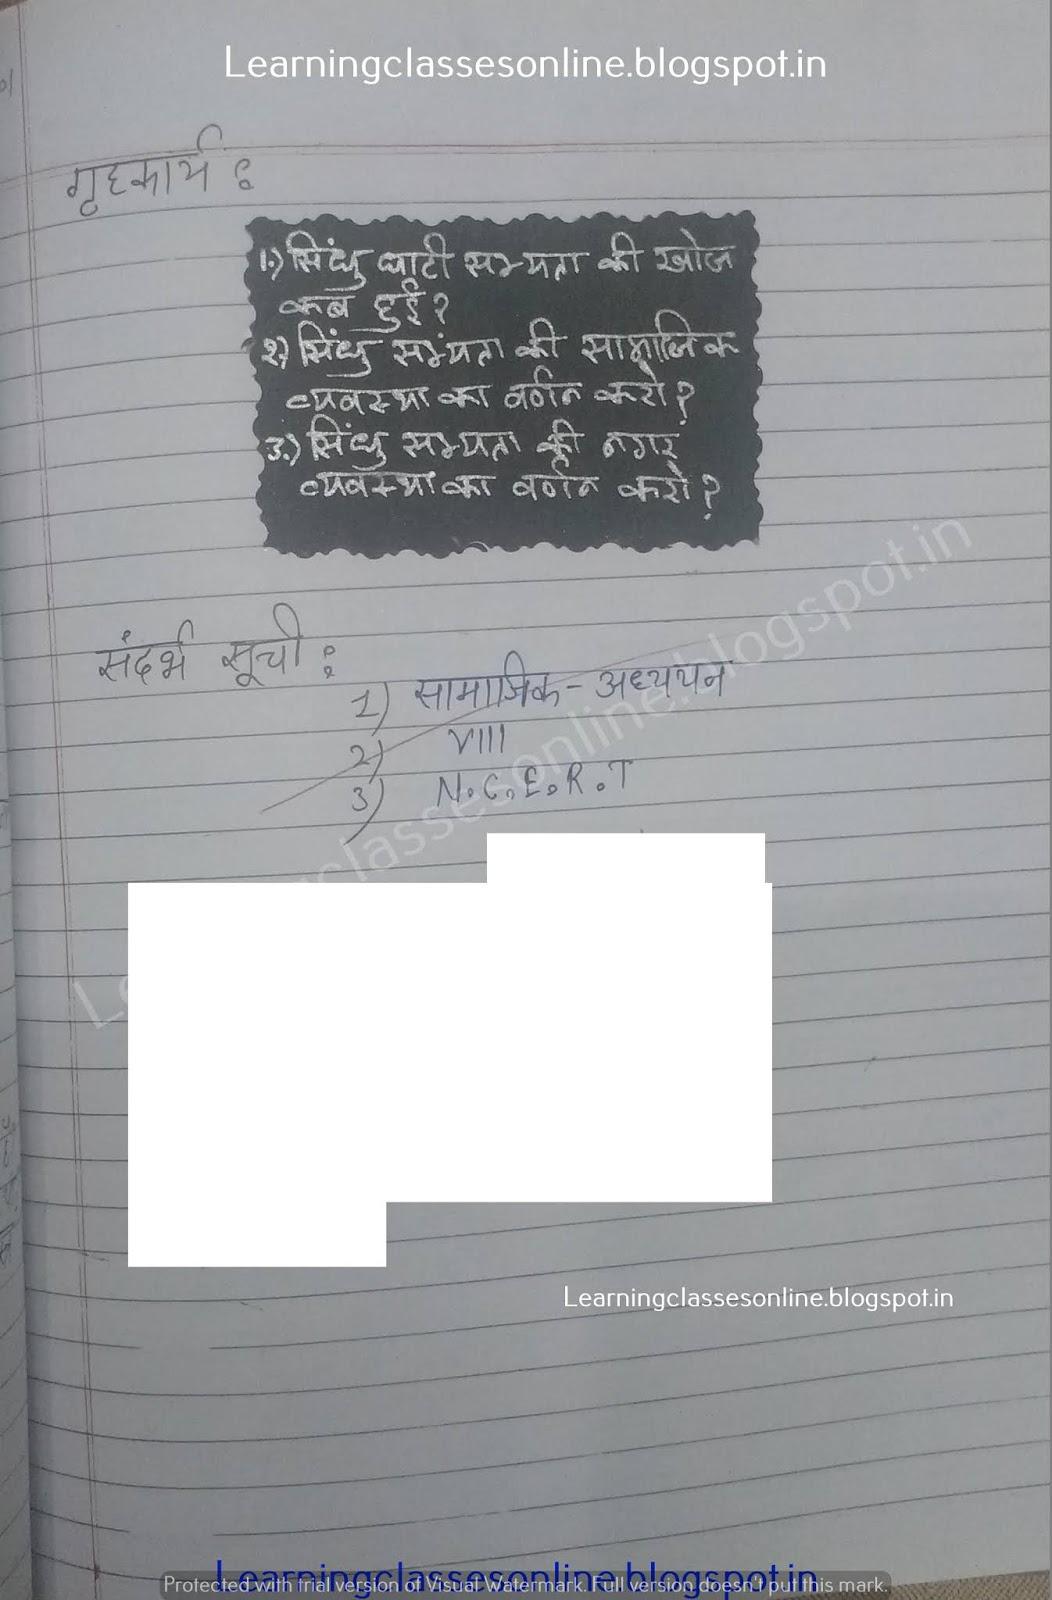 8th grade social studies lesson plans,